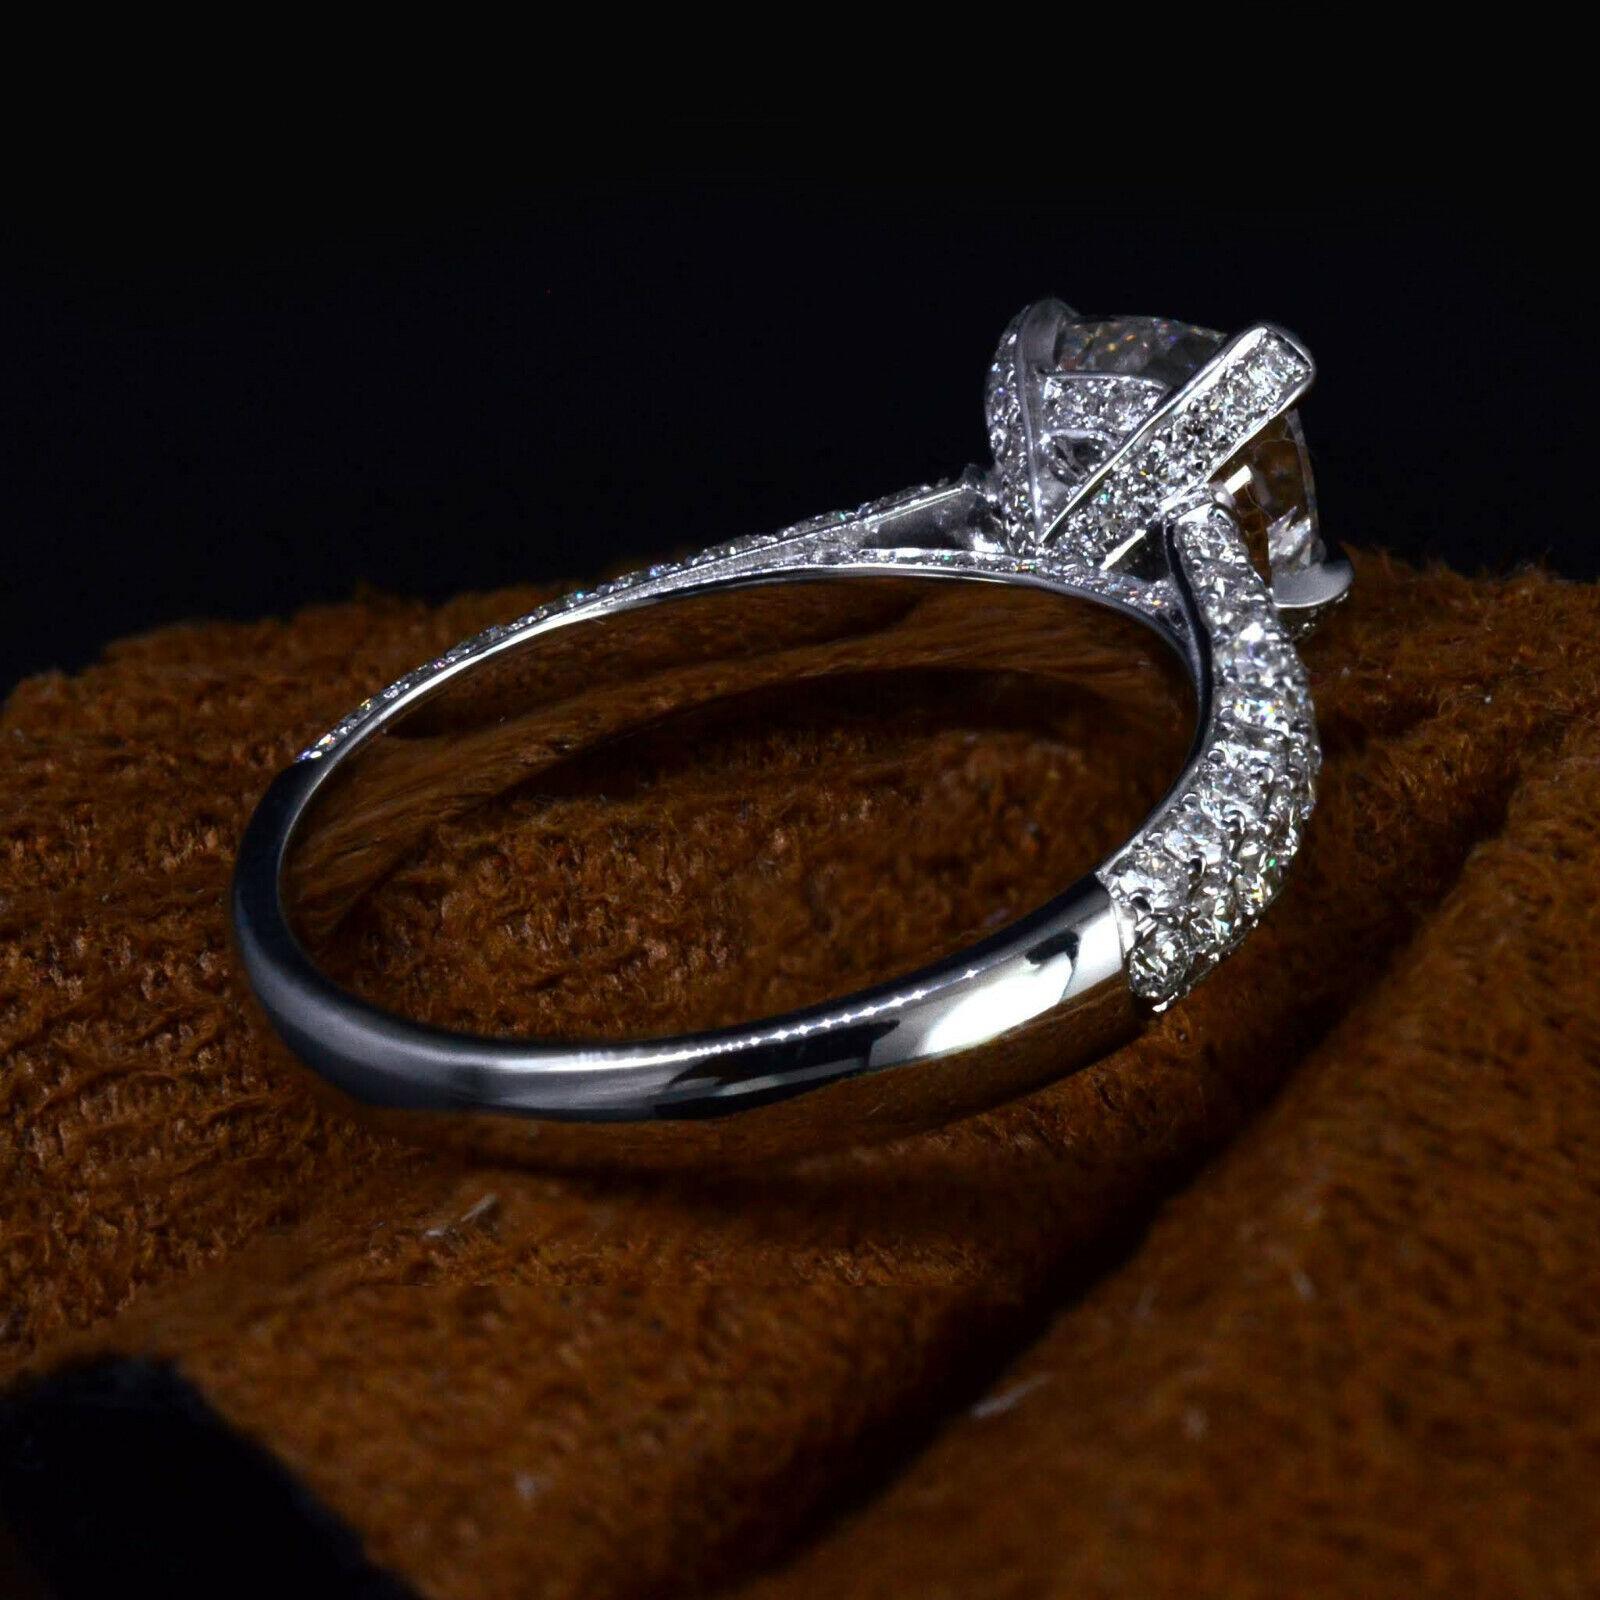 3.10 Ct Cushion Cut Diamond Engagement Ring Round Cut Micro Pave H,VS1 GIA 14K 3